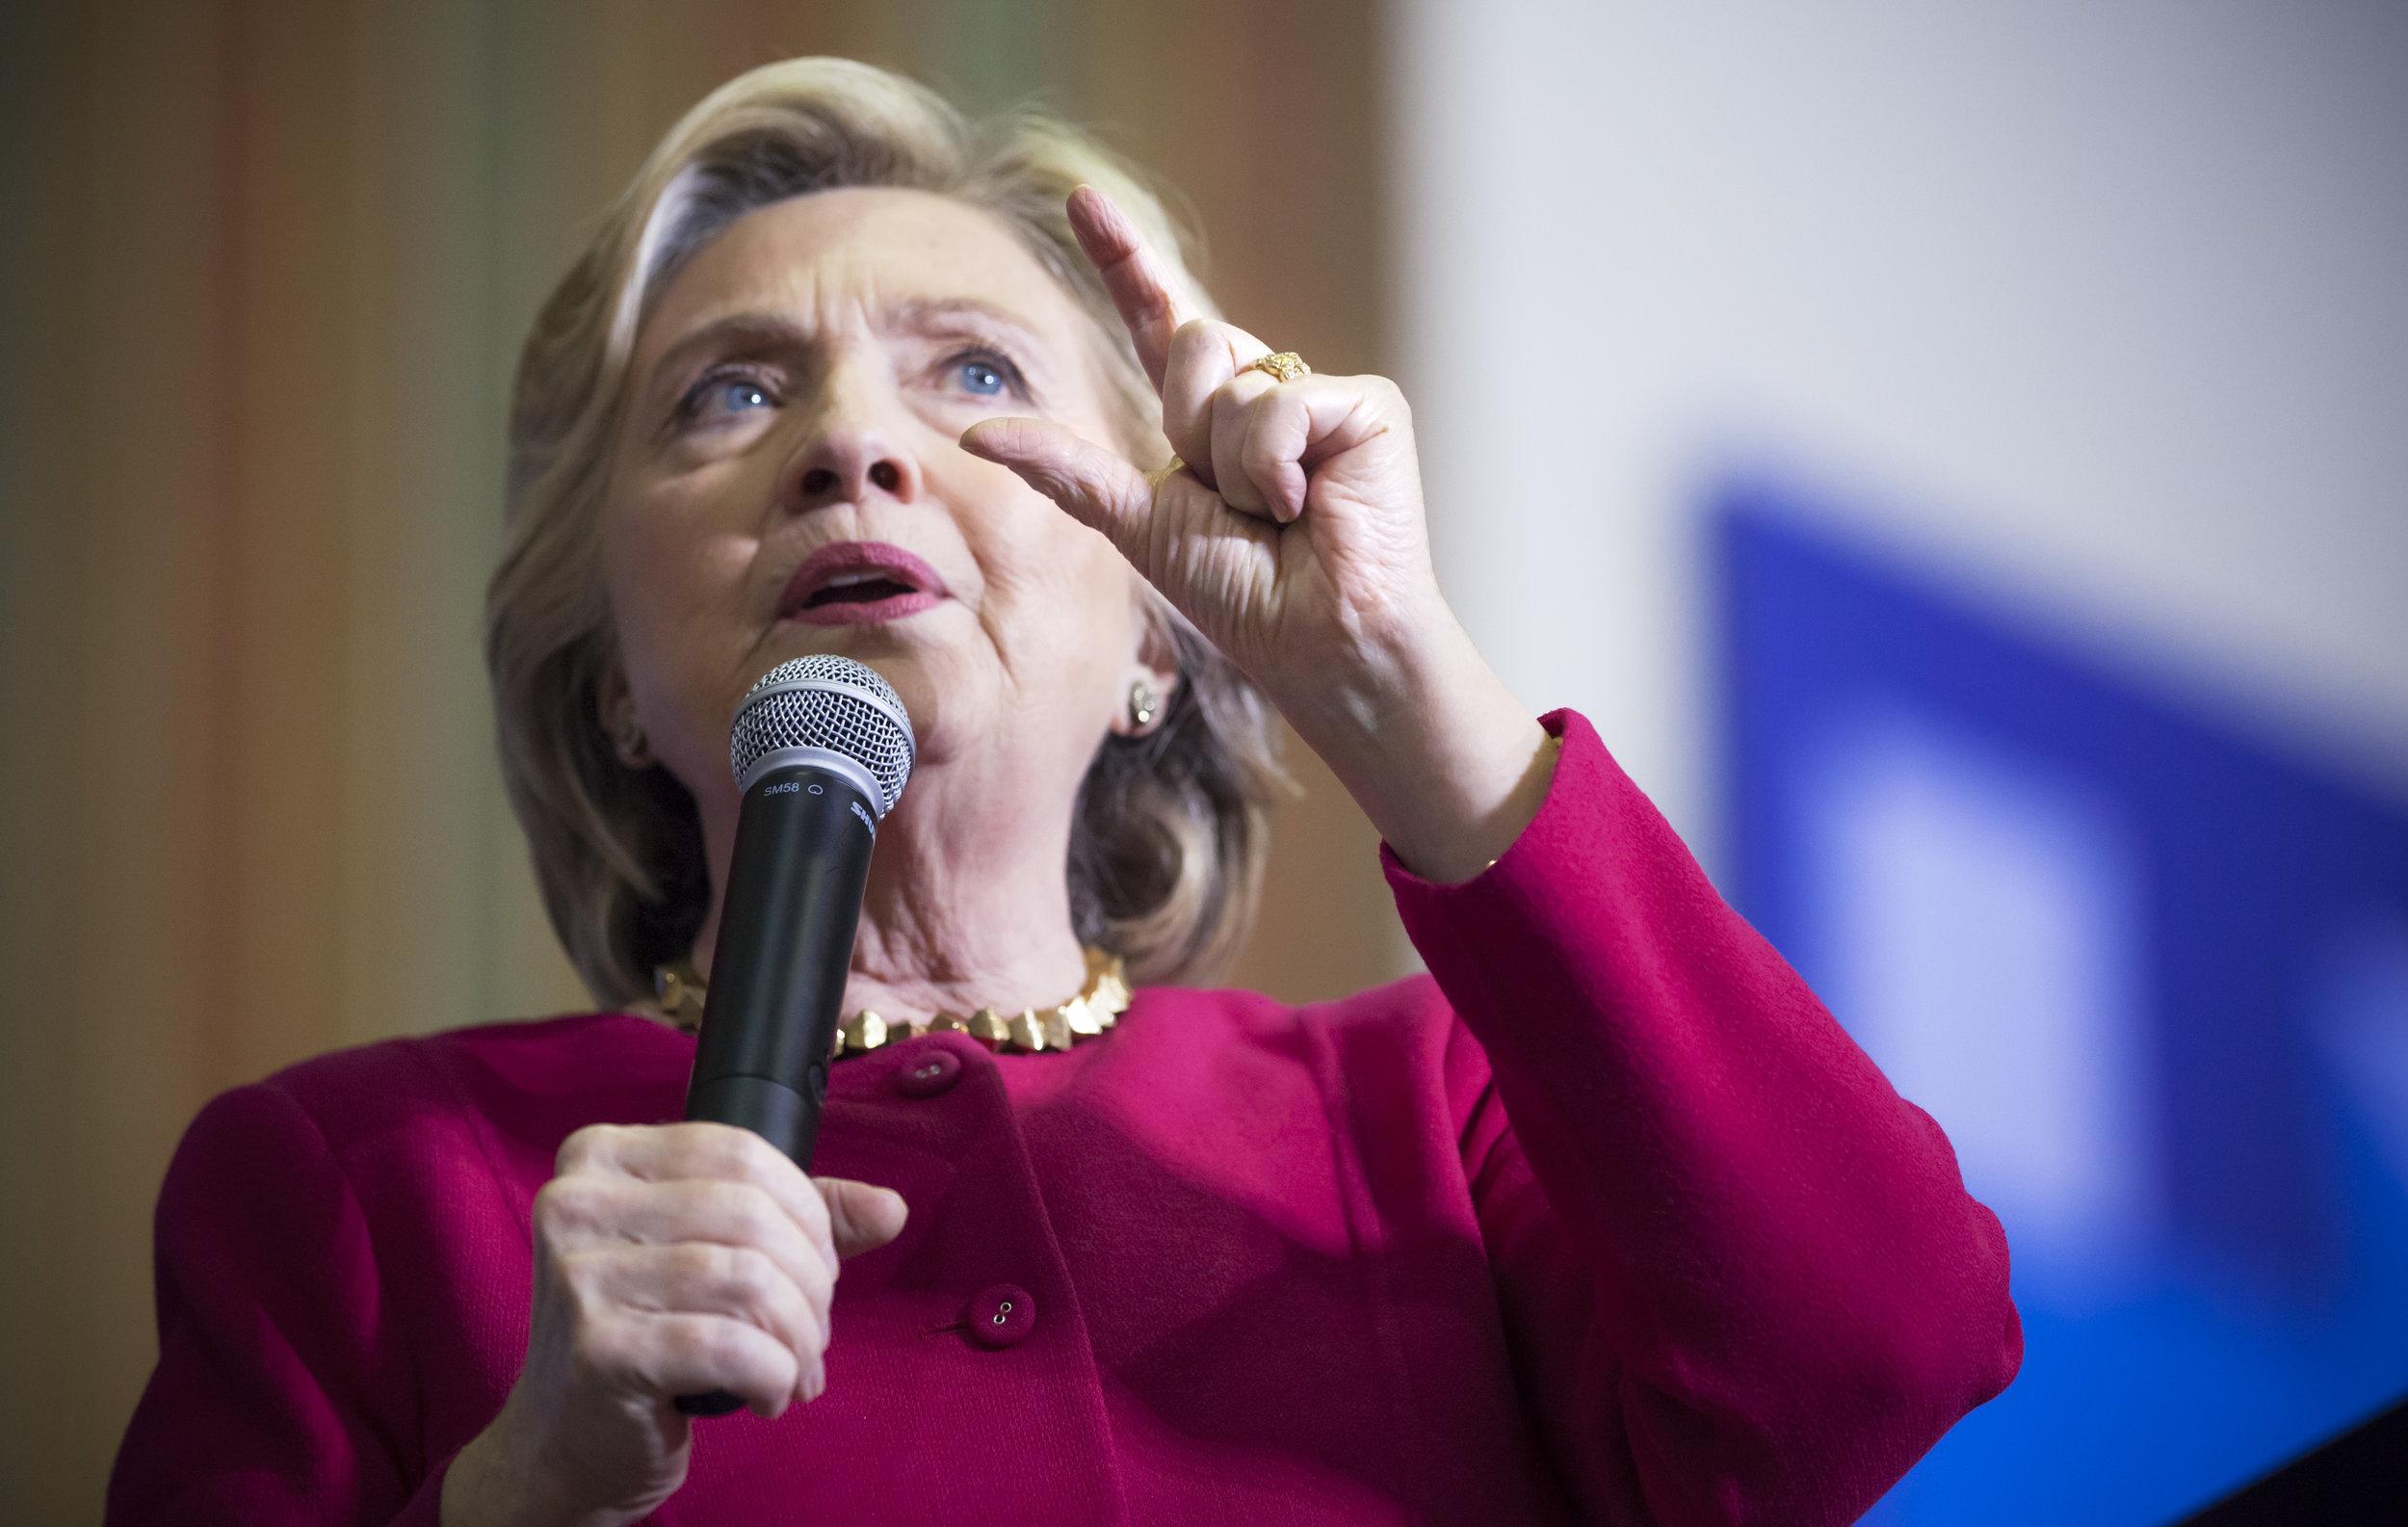 10042016_BJM_Hillary_Clinton_Campaigns_in_Harrisburg_Pennsylvania_21.jpg